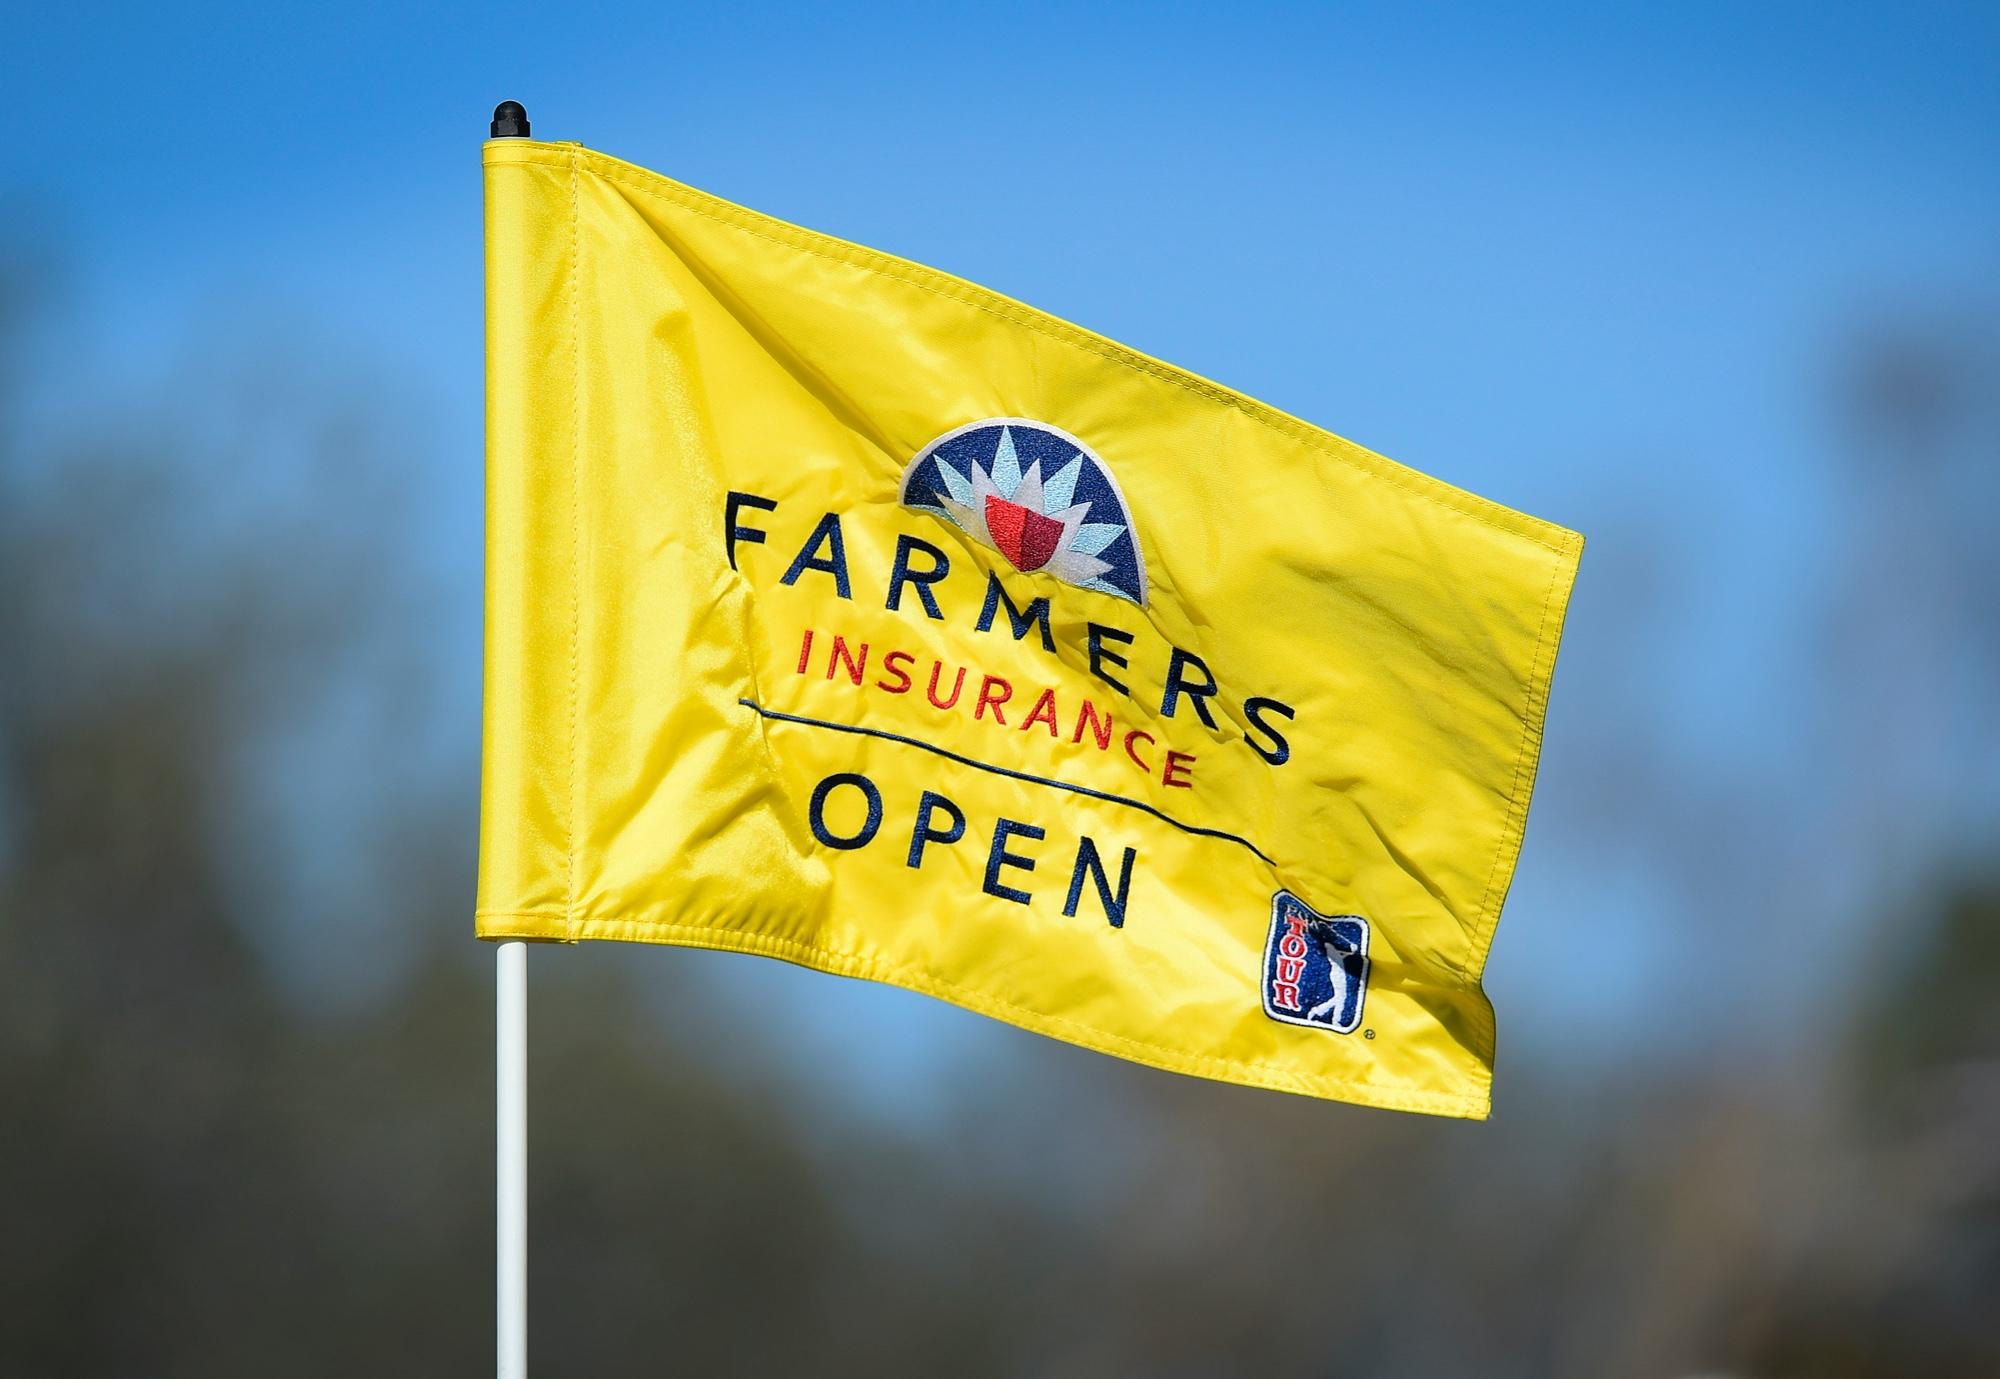 Farmers Insurance Open prize money 2020 | National Club Golfer